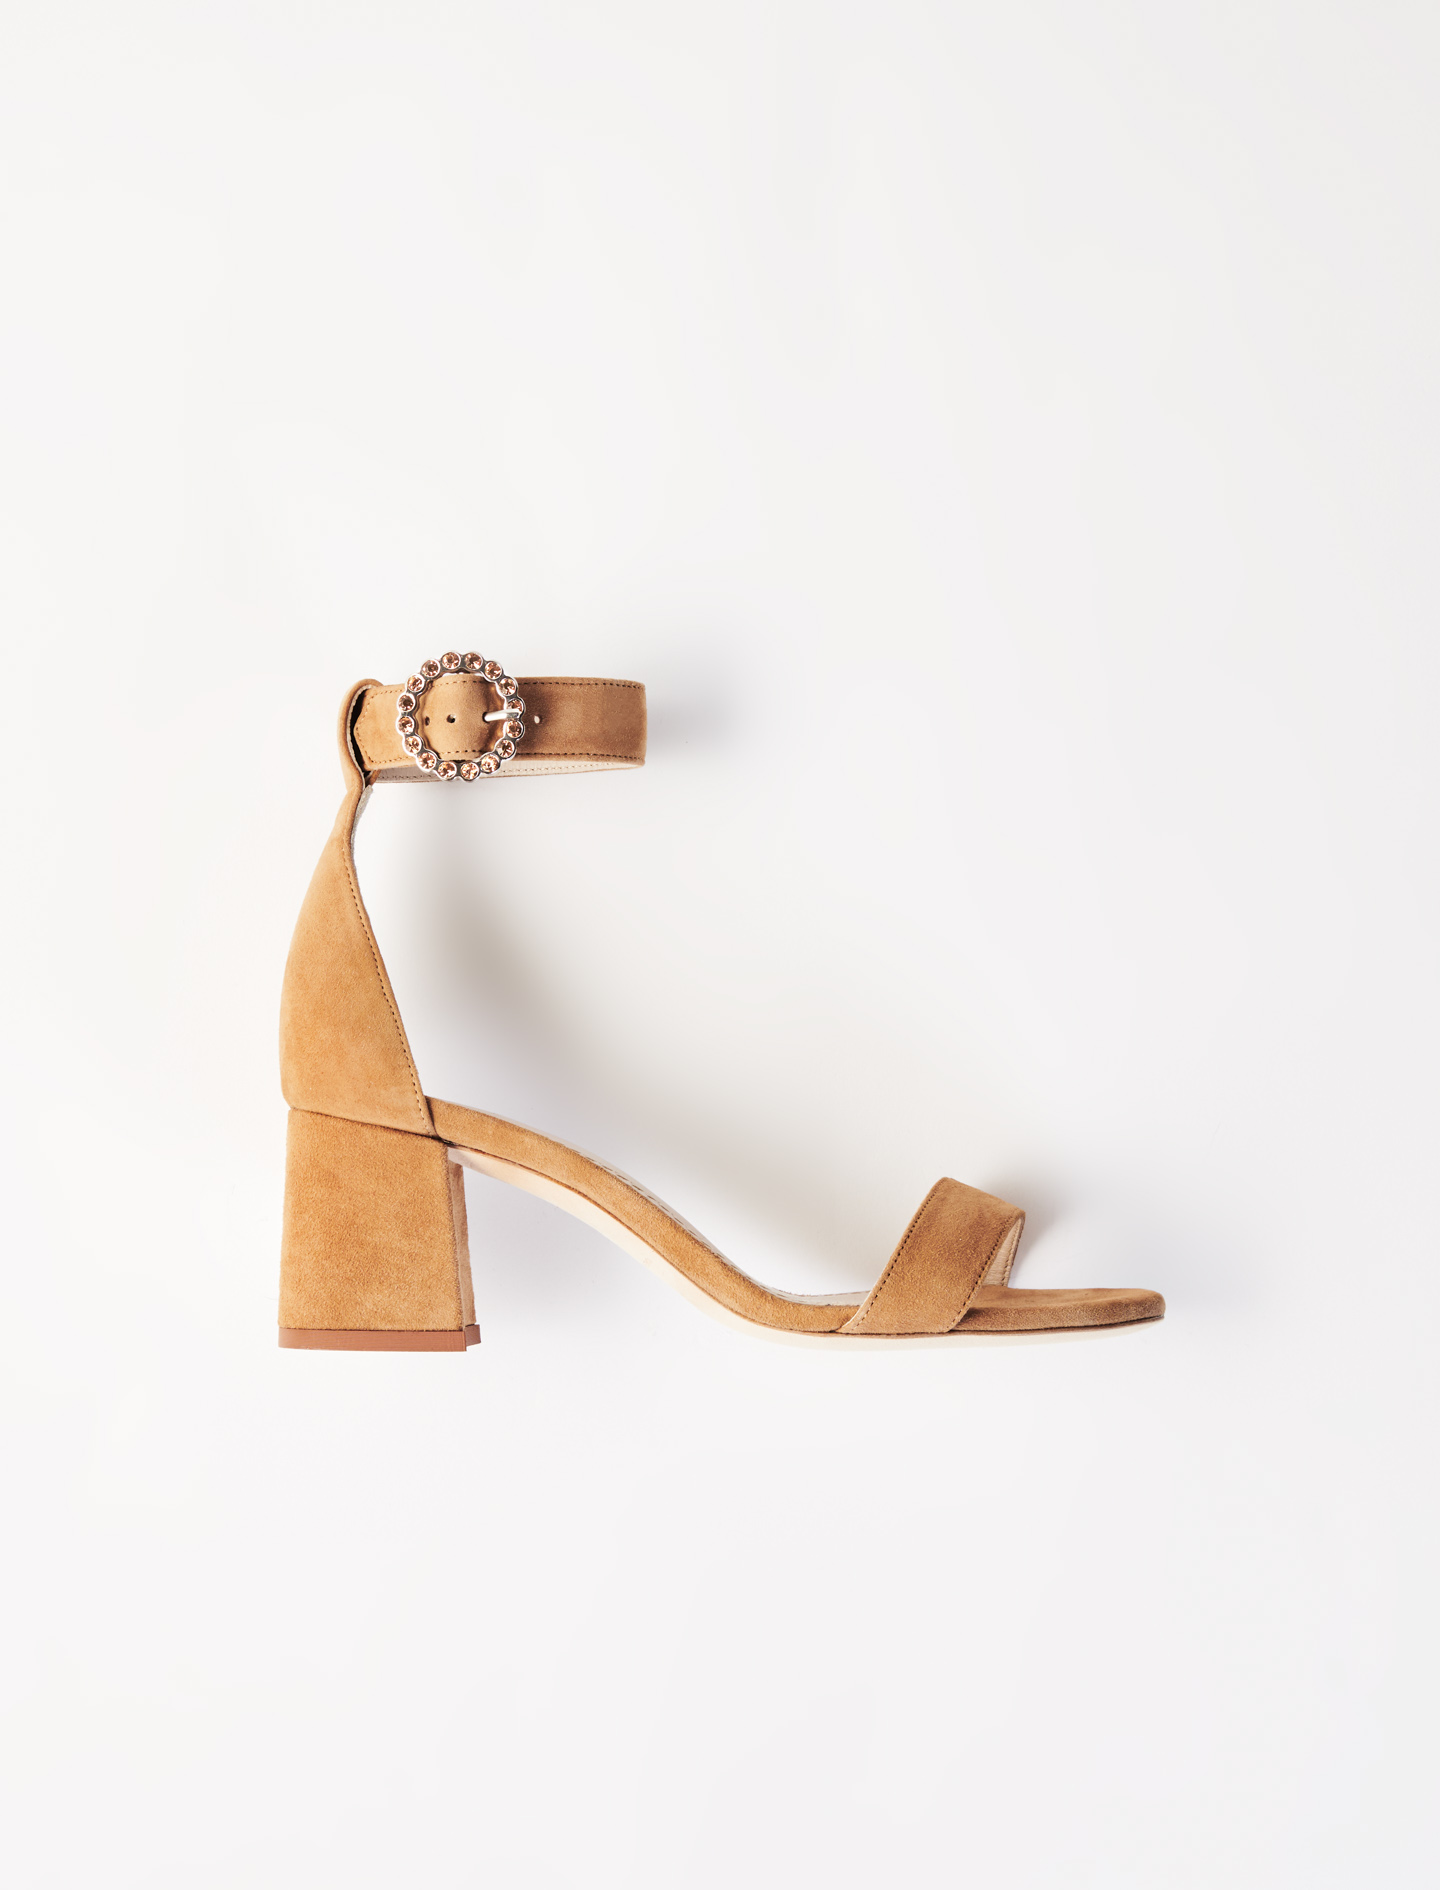 Strappy Midi-Heeled Sandals  - Camel